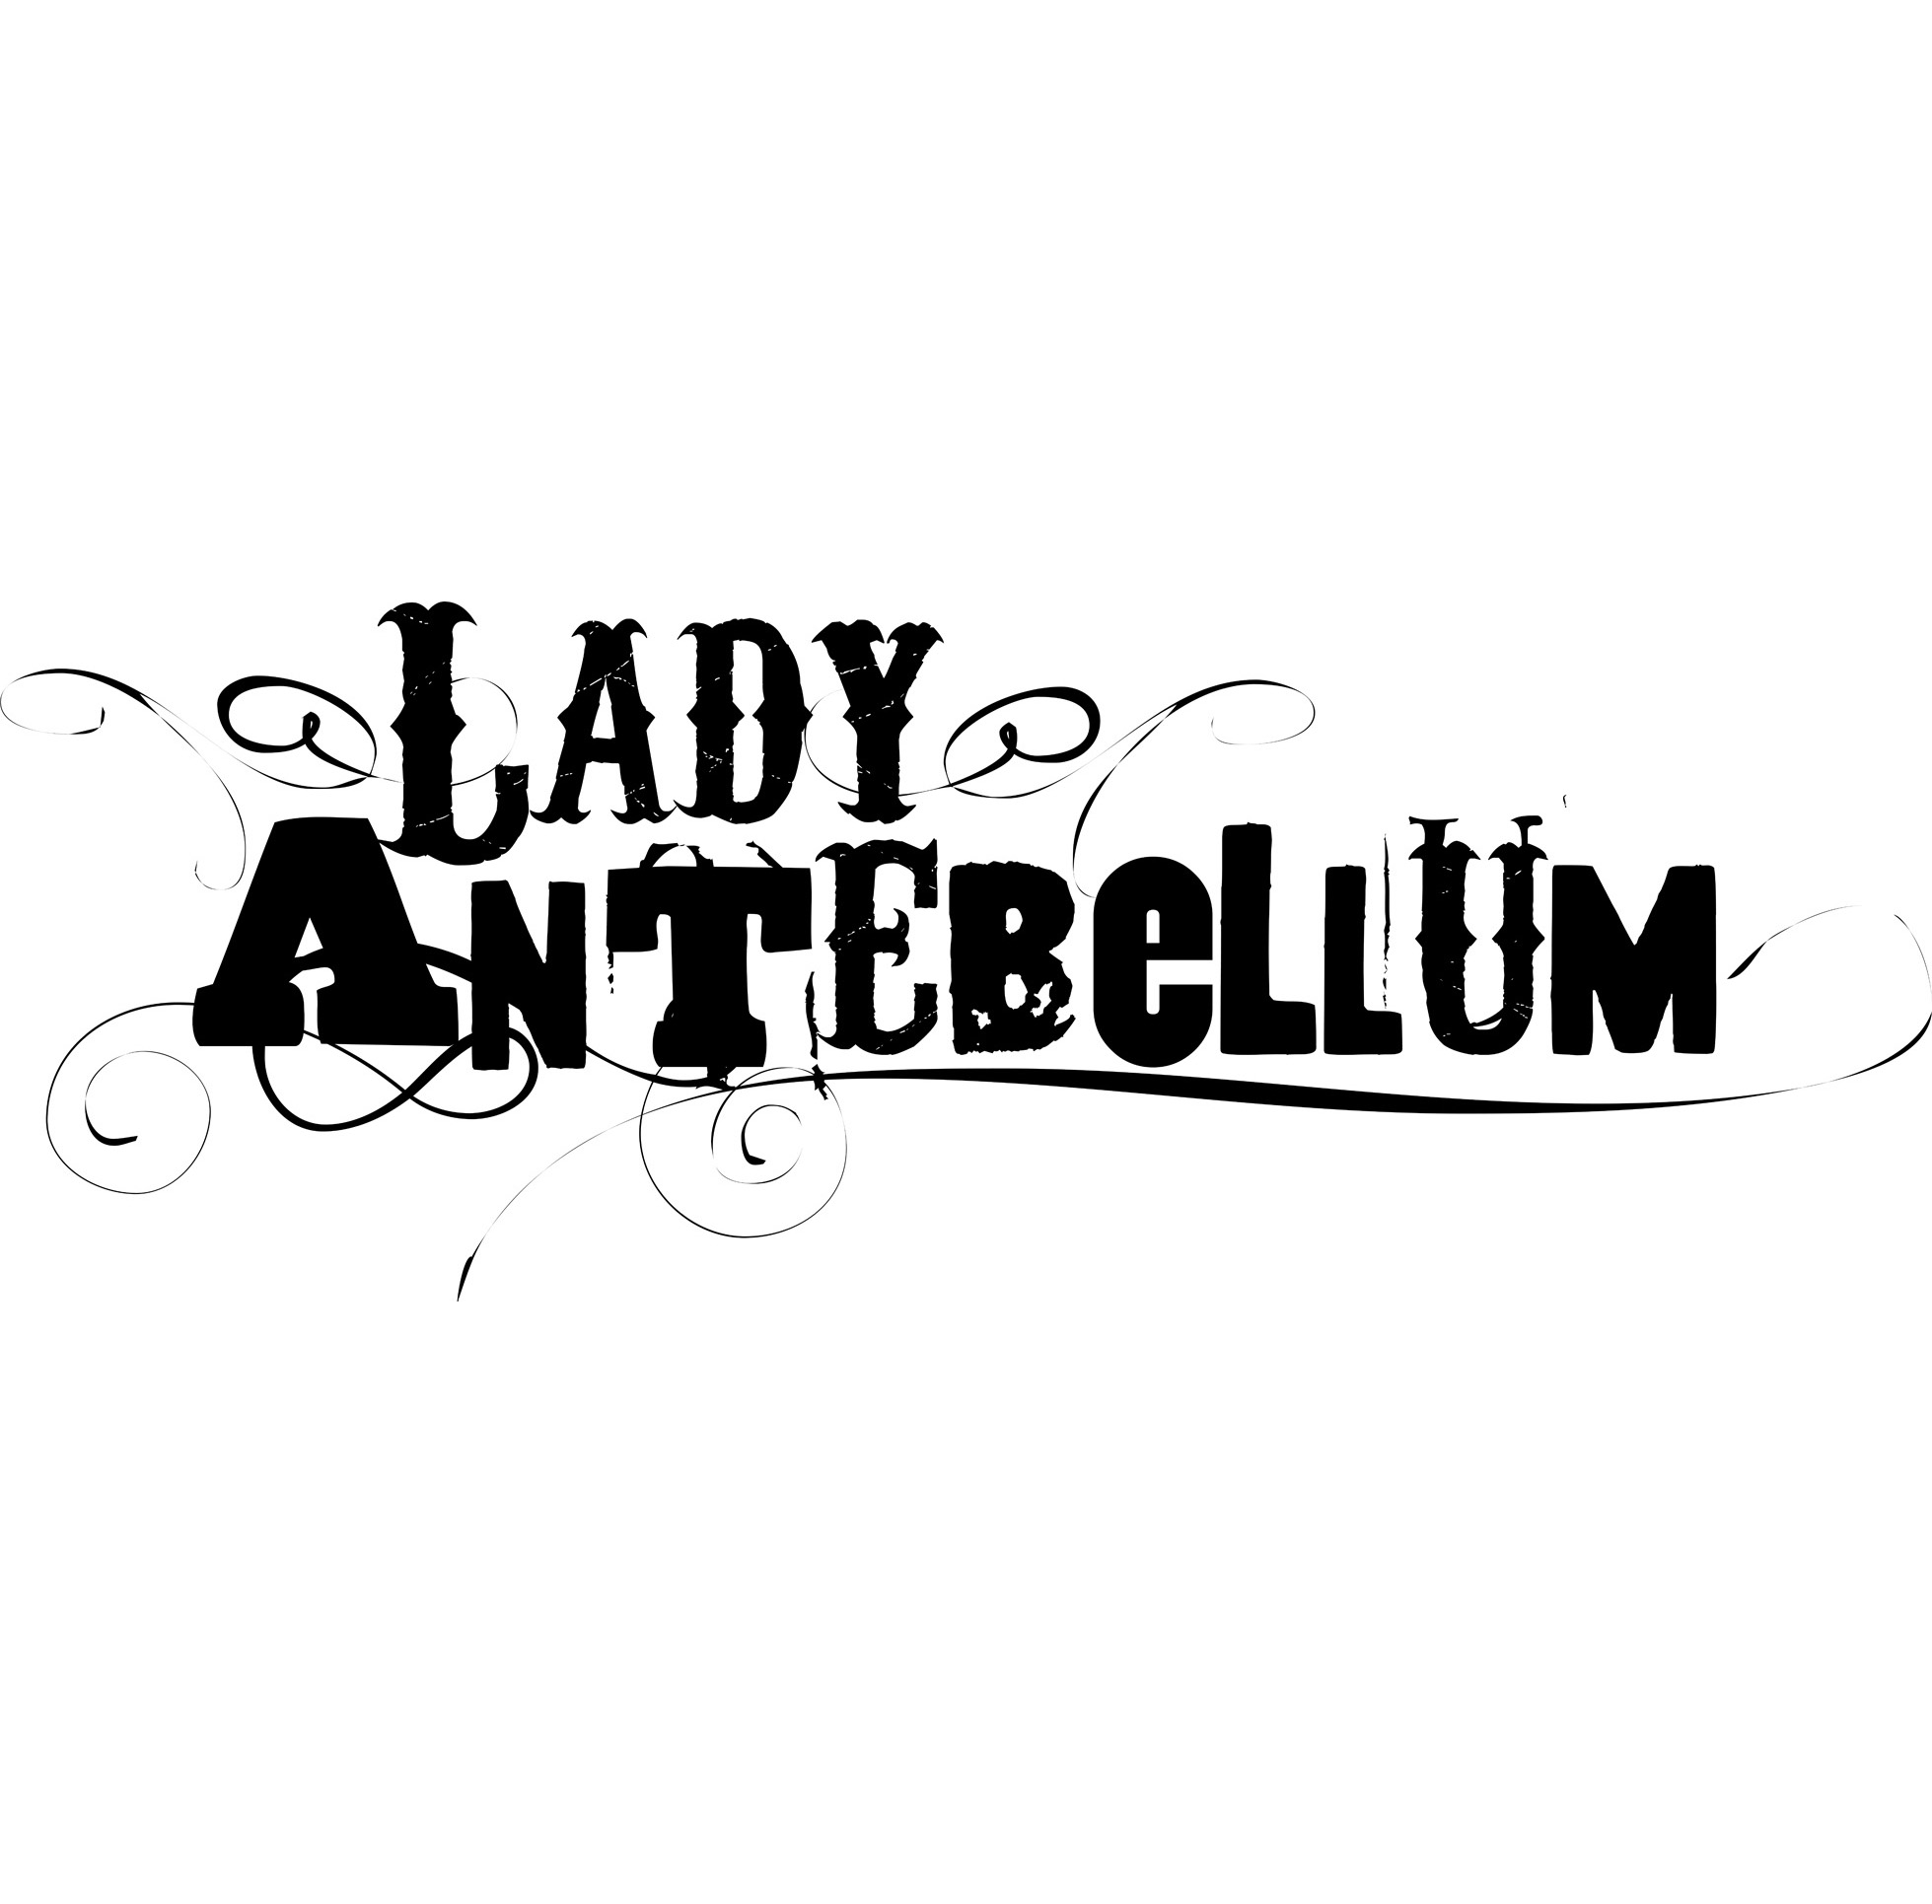 LadyAntebel fnl logo.jpg